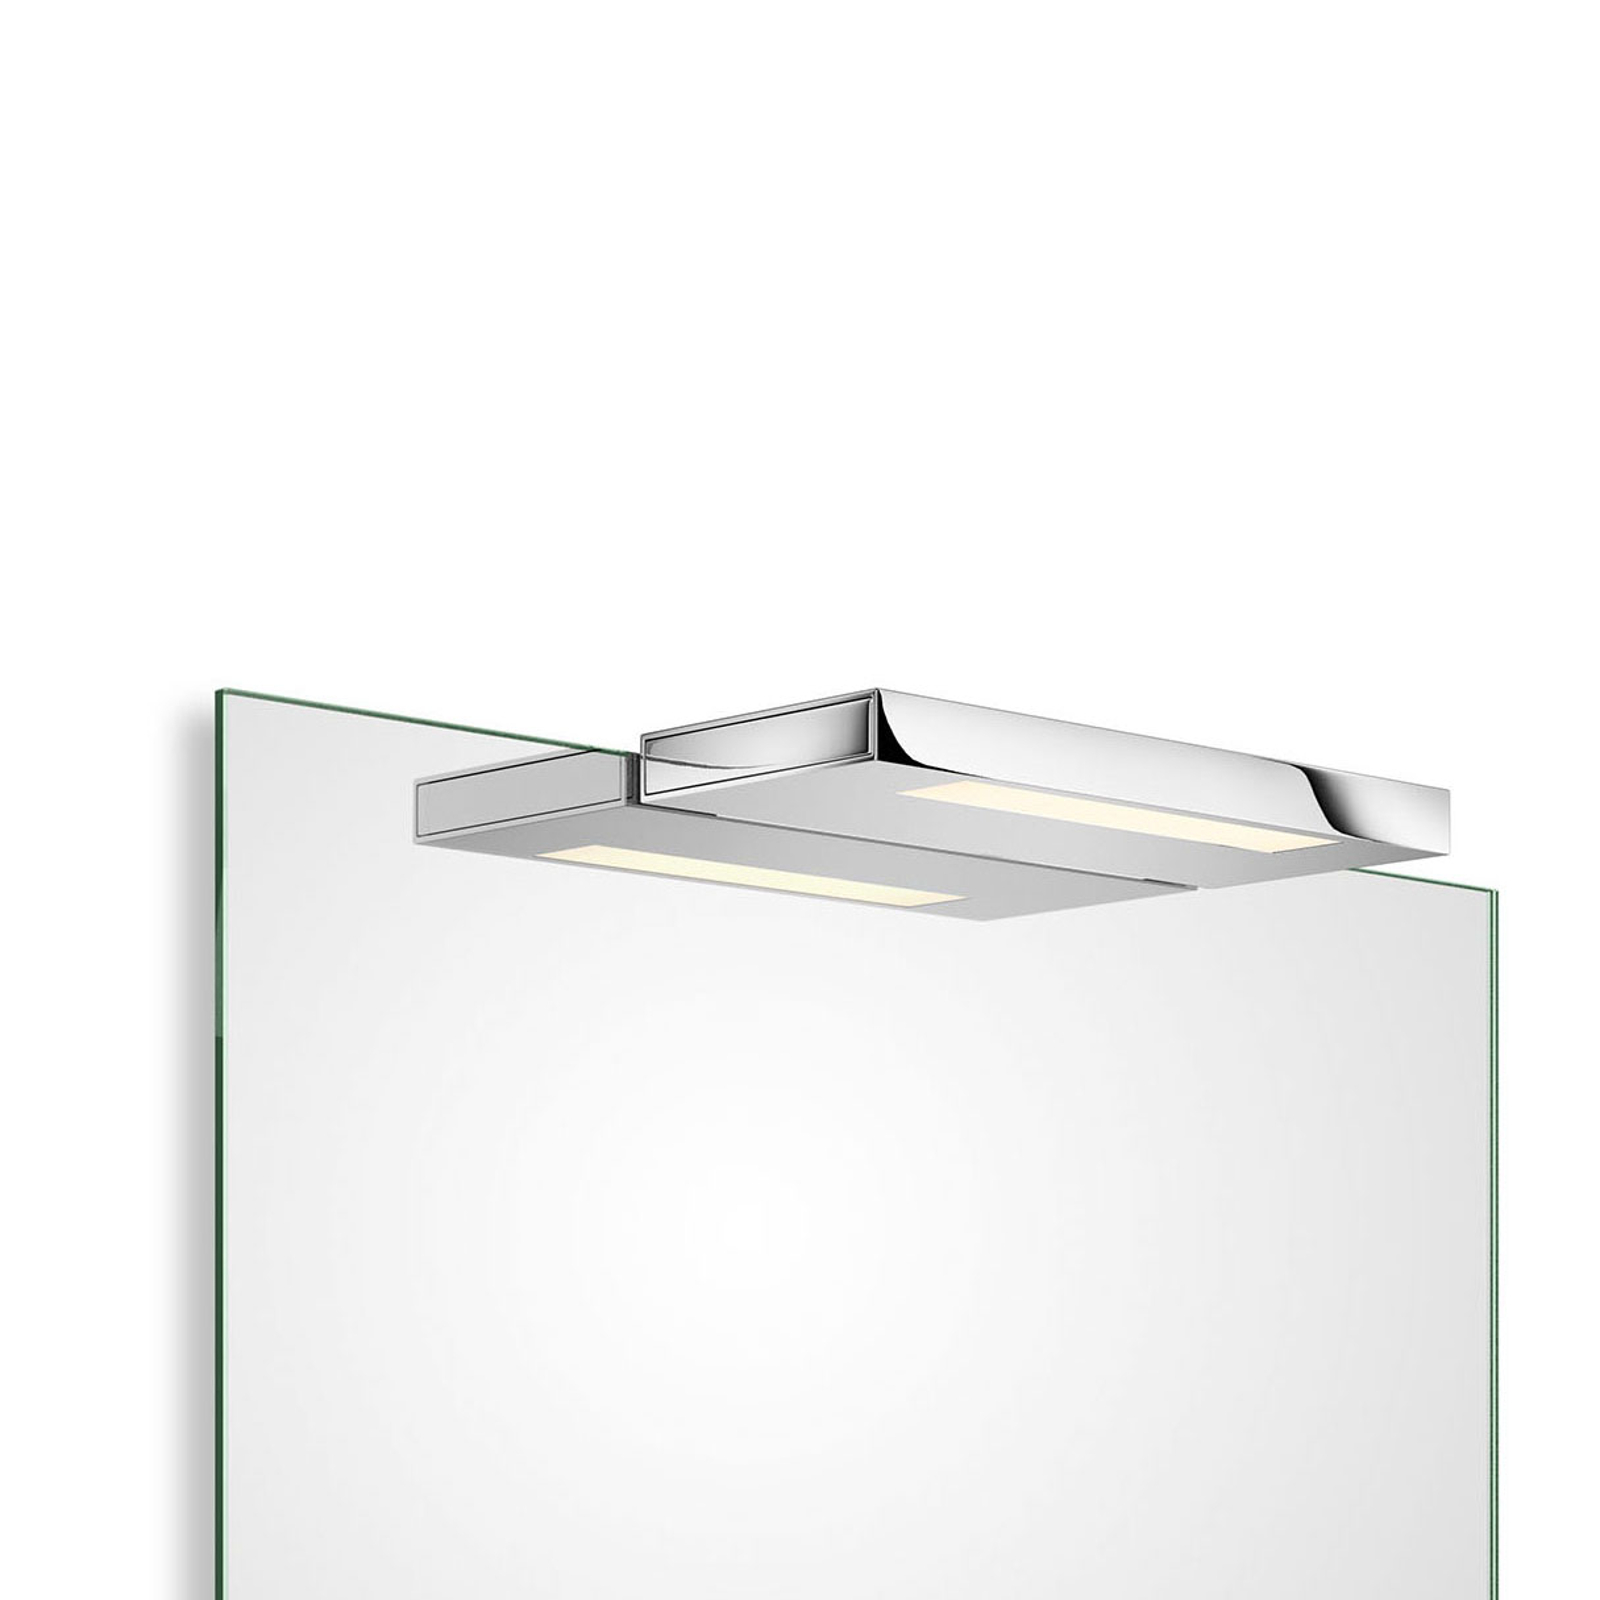 Decor Walther Slim 1-24 N LED lamp 24cm chroom